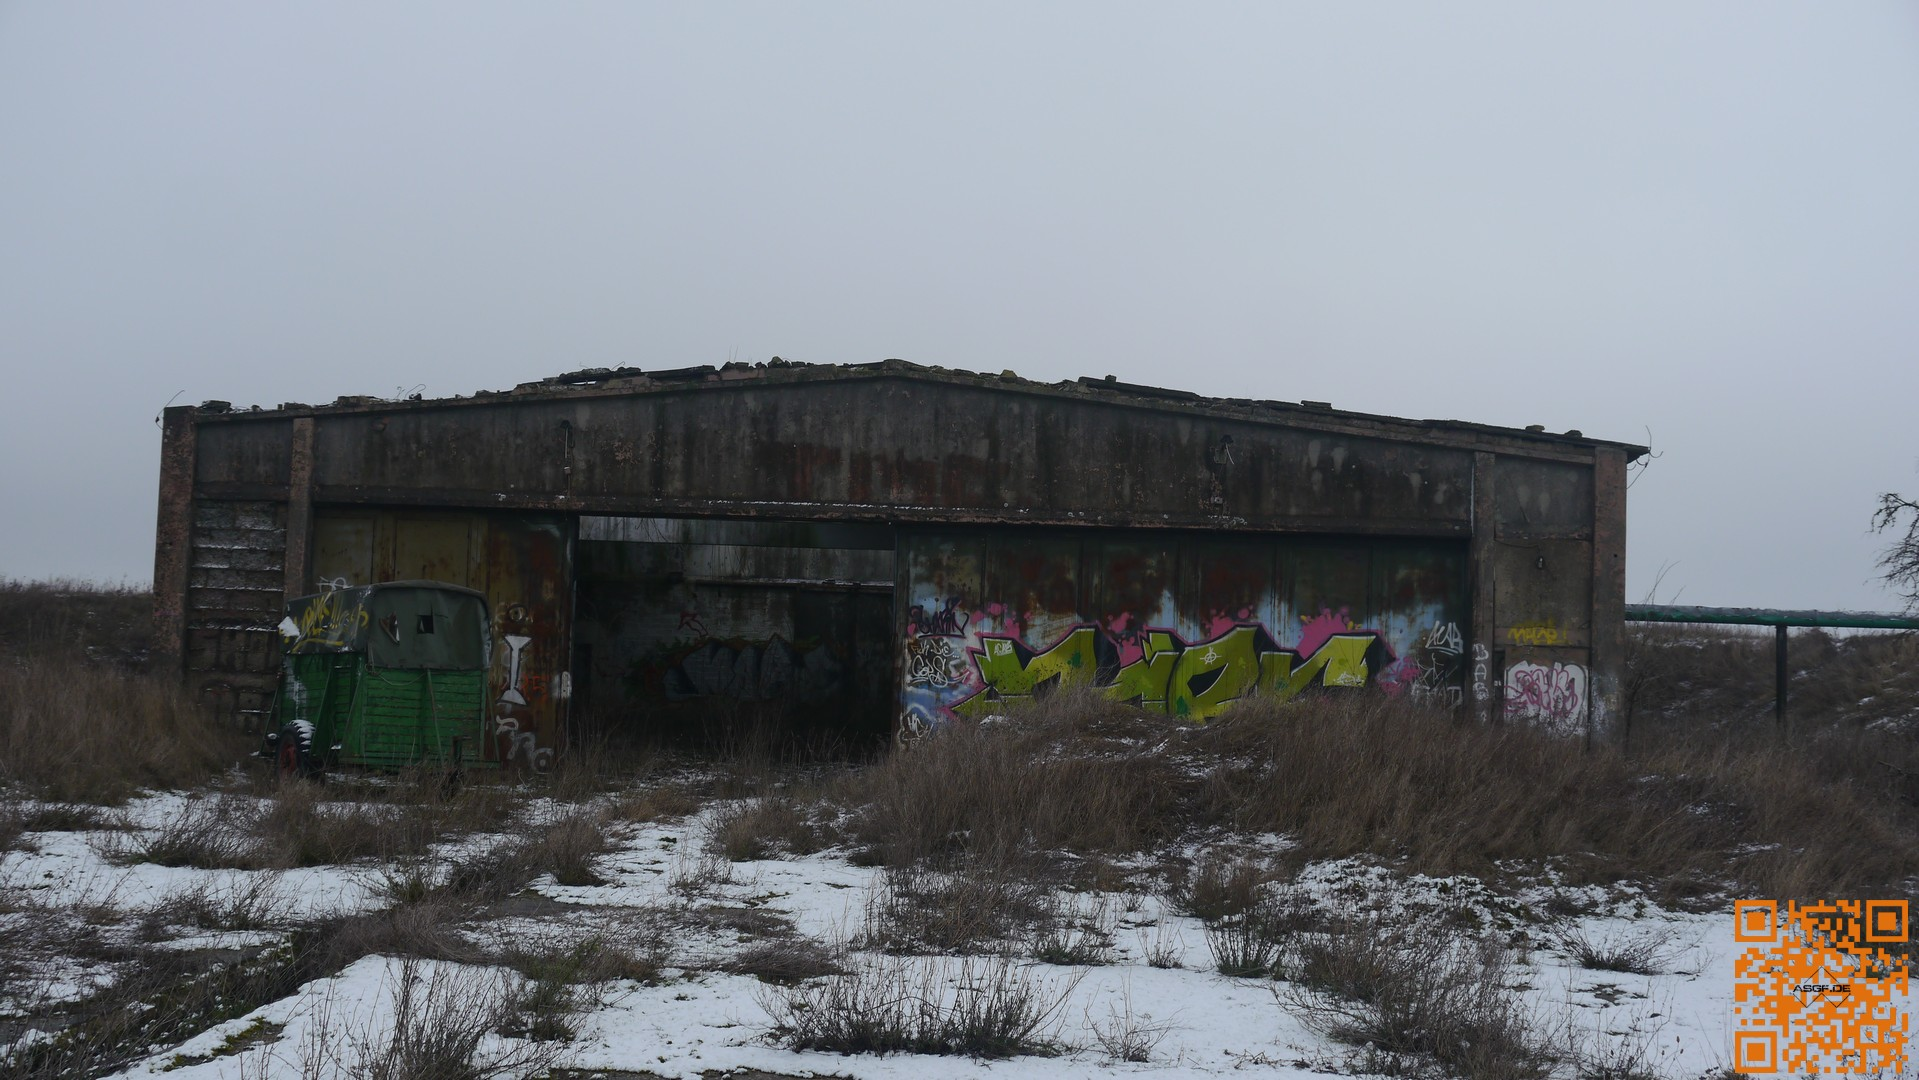 NuklearEgoT-15-1-17-021